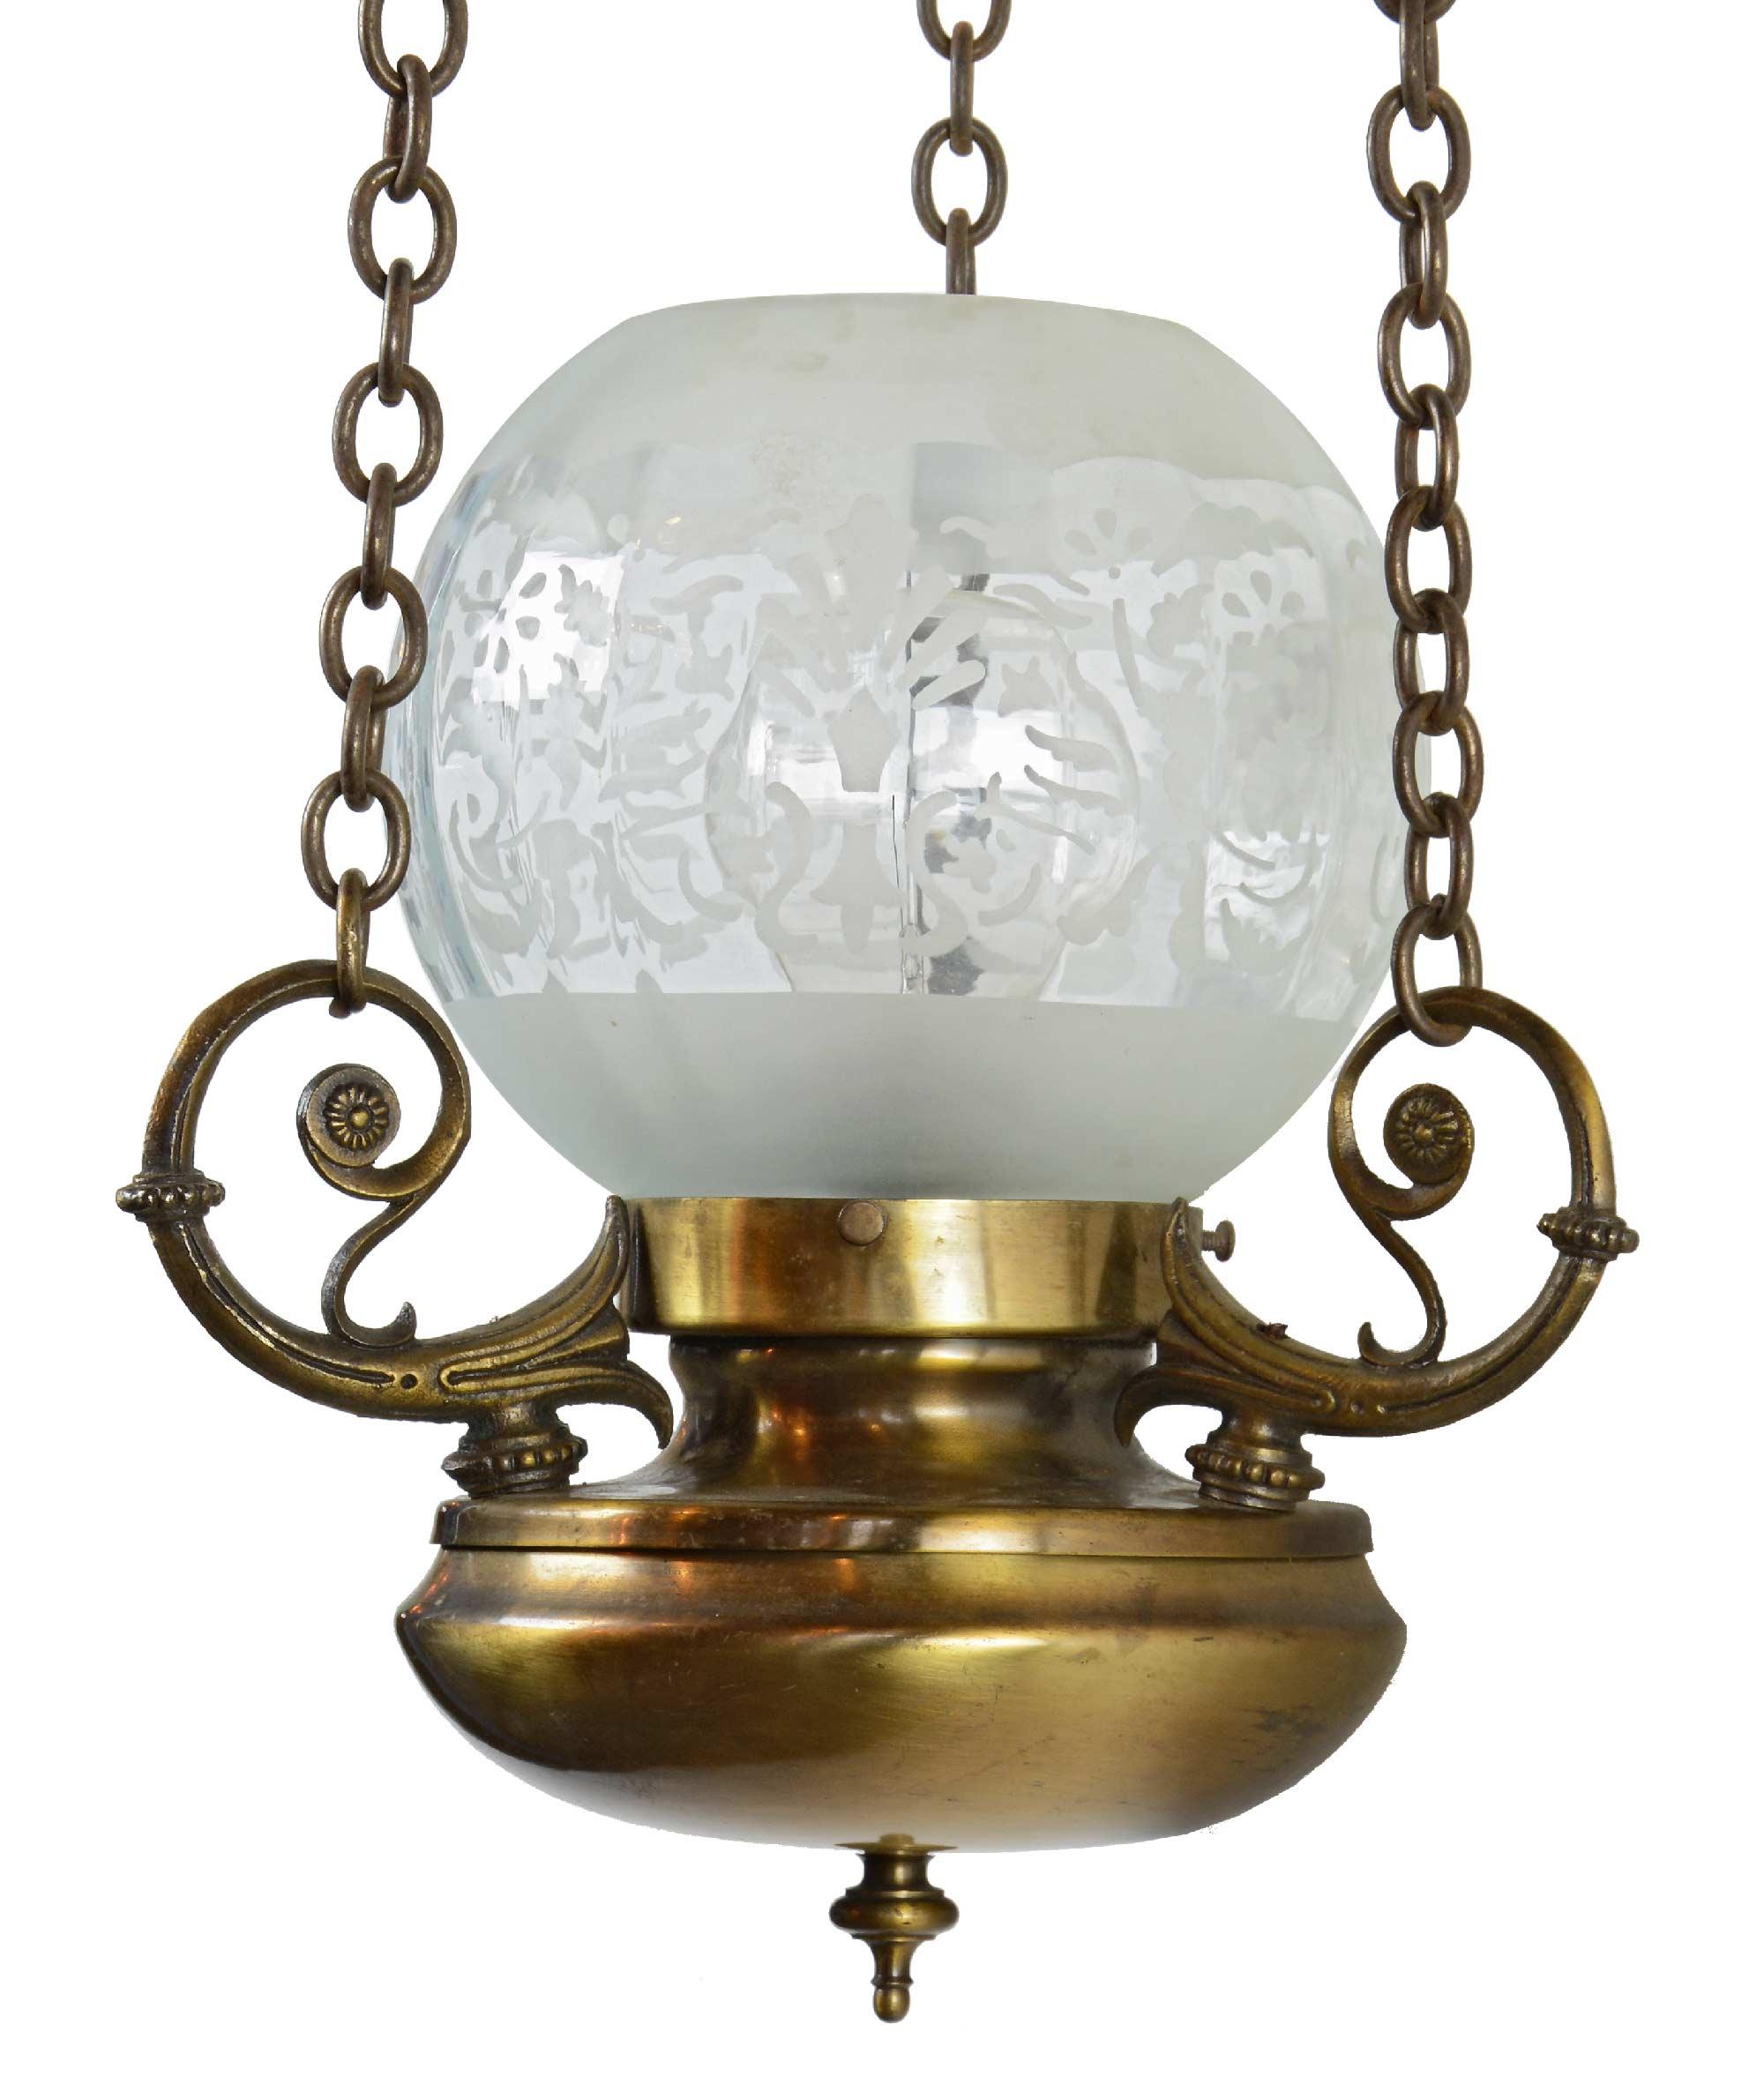 46814-brass-3-chain-neoclassical-pendant-globe.jpg